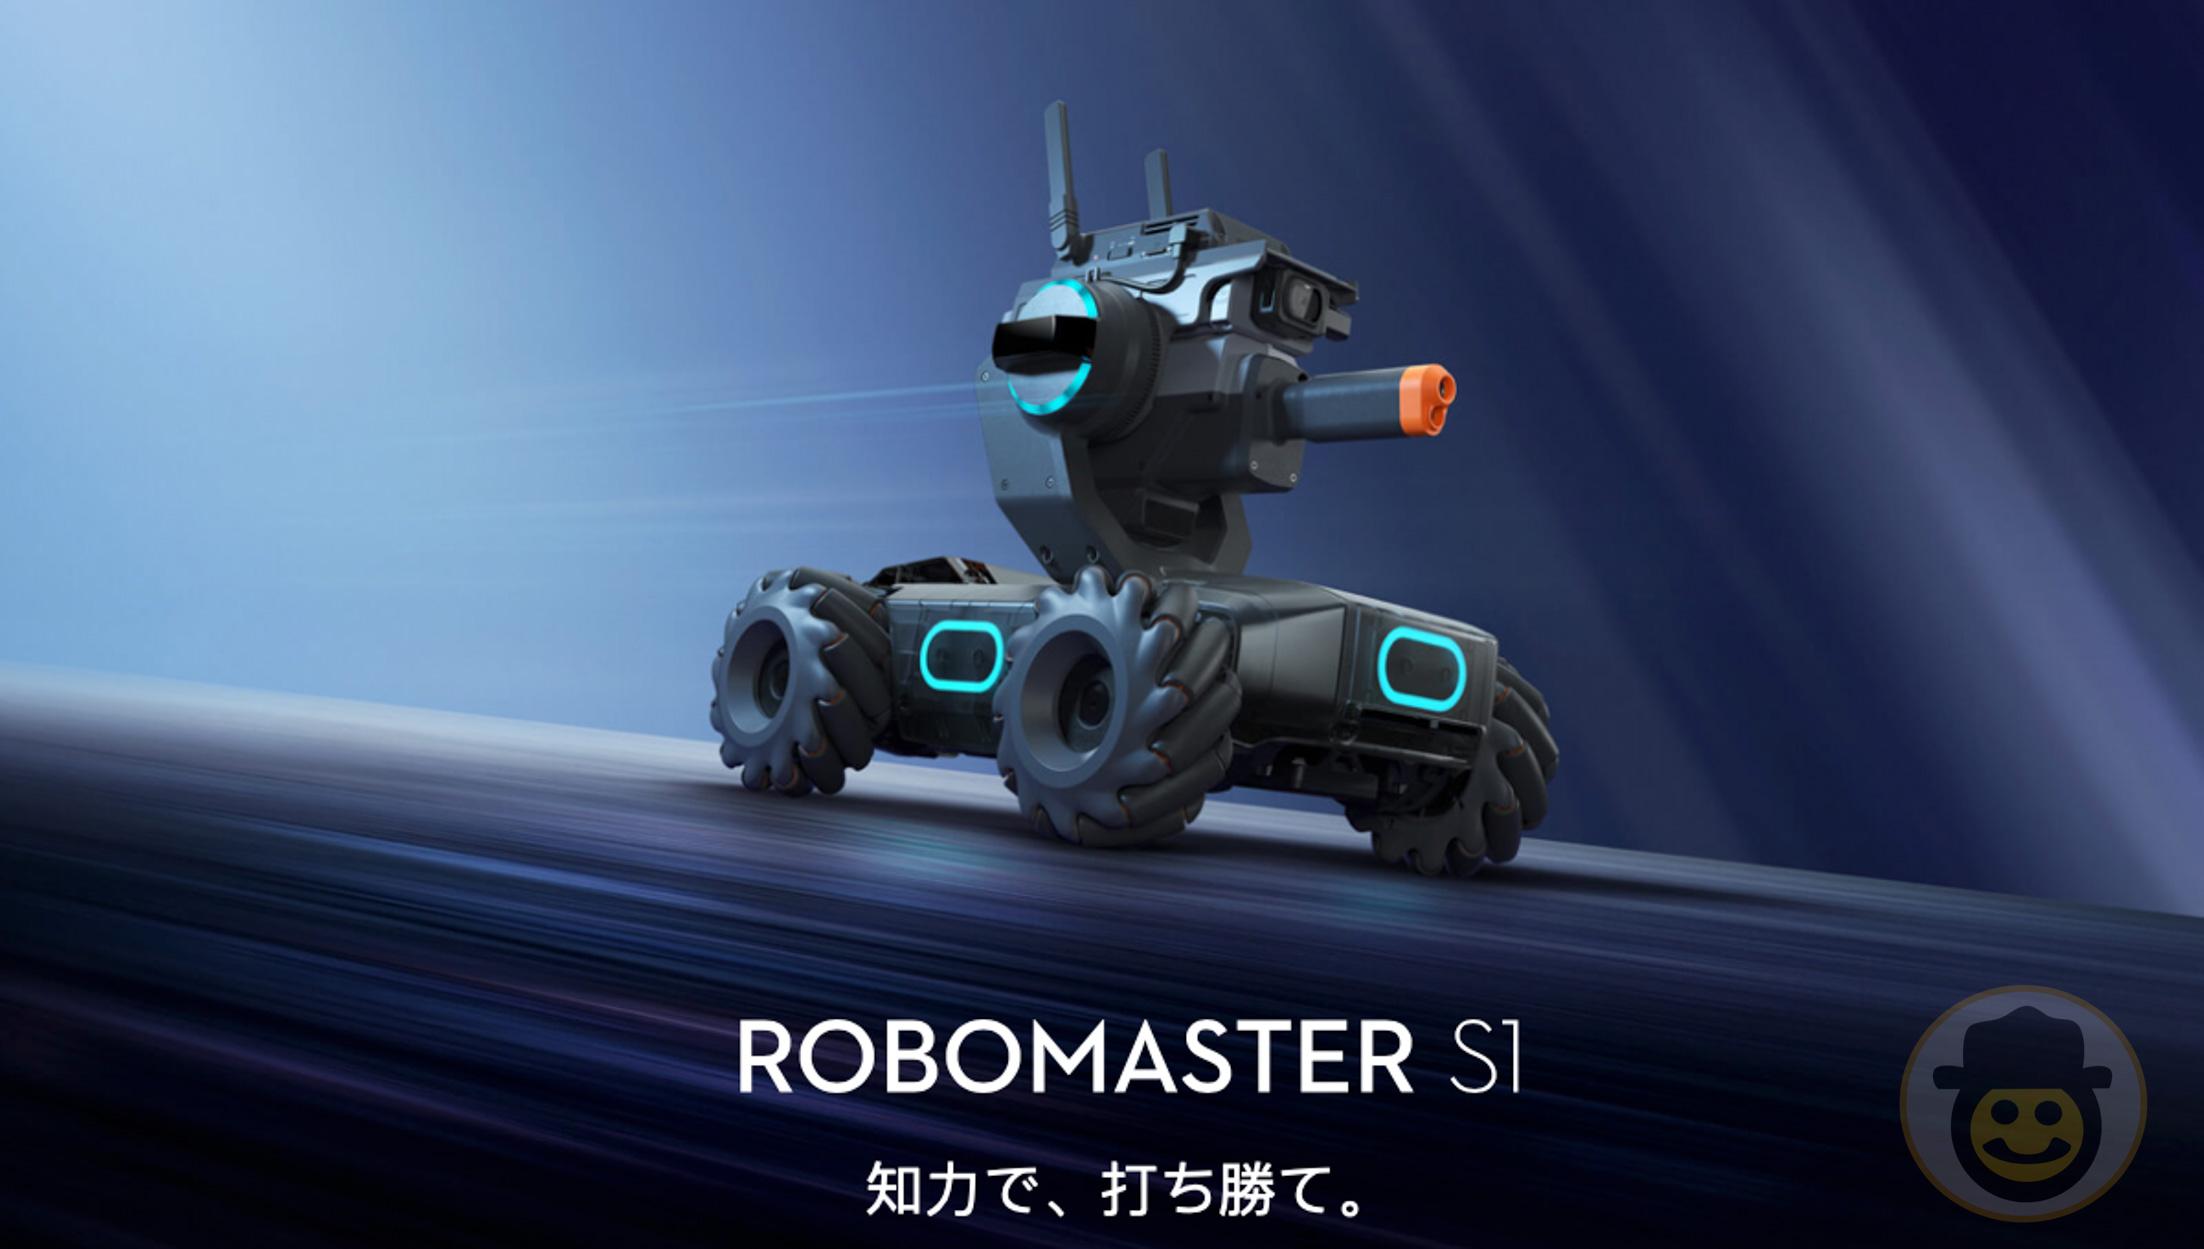 DJI [ROBOMASTER S1] できることの「スペック」と「まとめ」